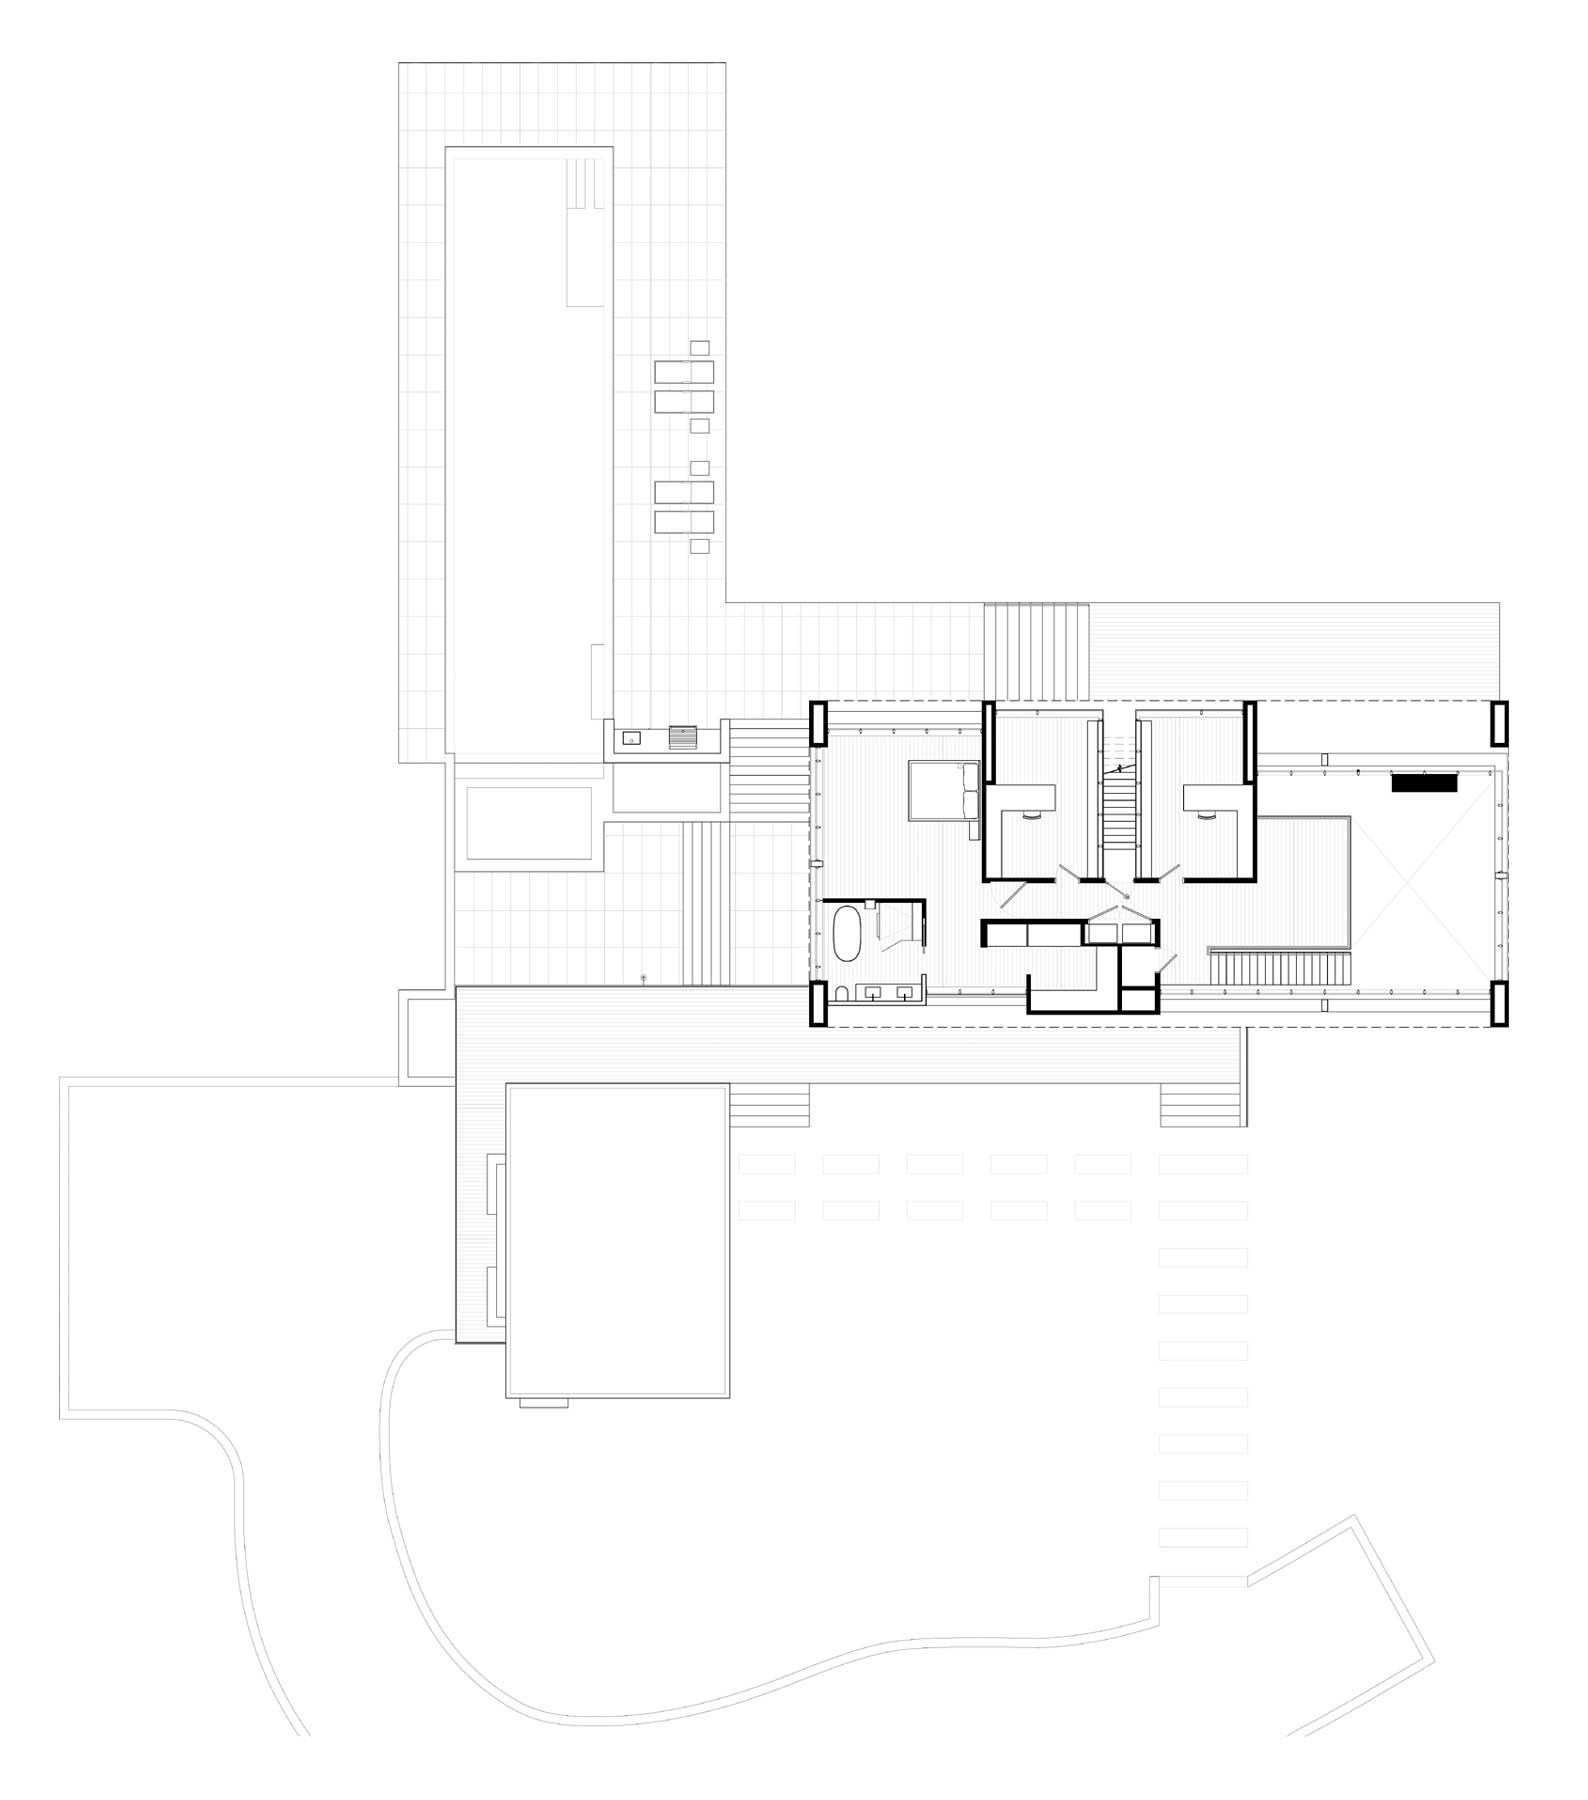 Transparency - Barnes Coy Architects - Hamptons Architetcs